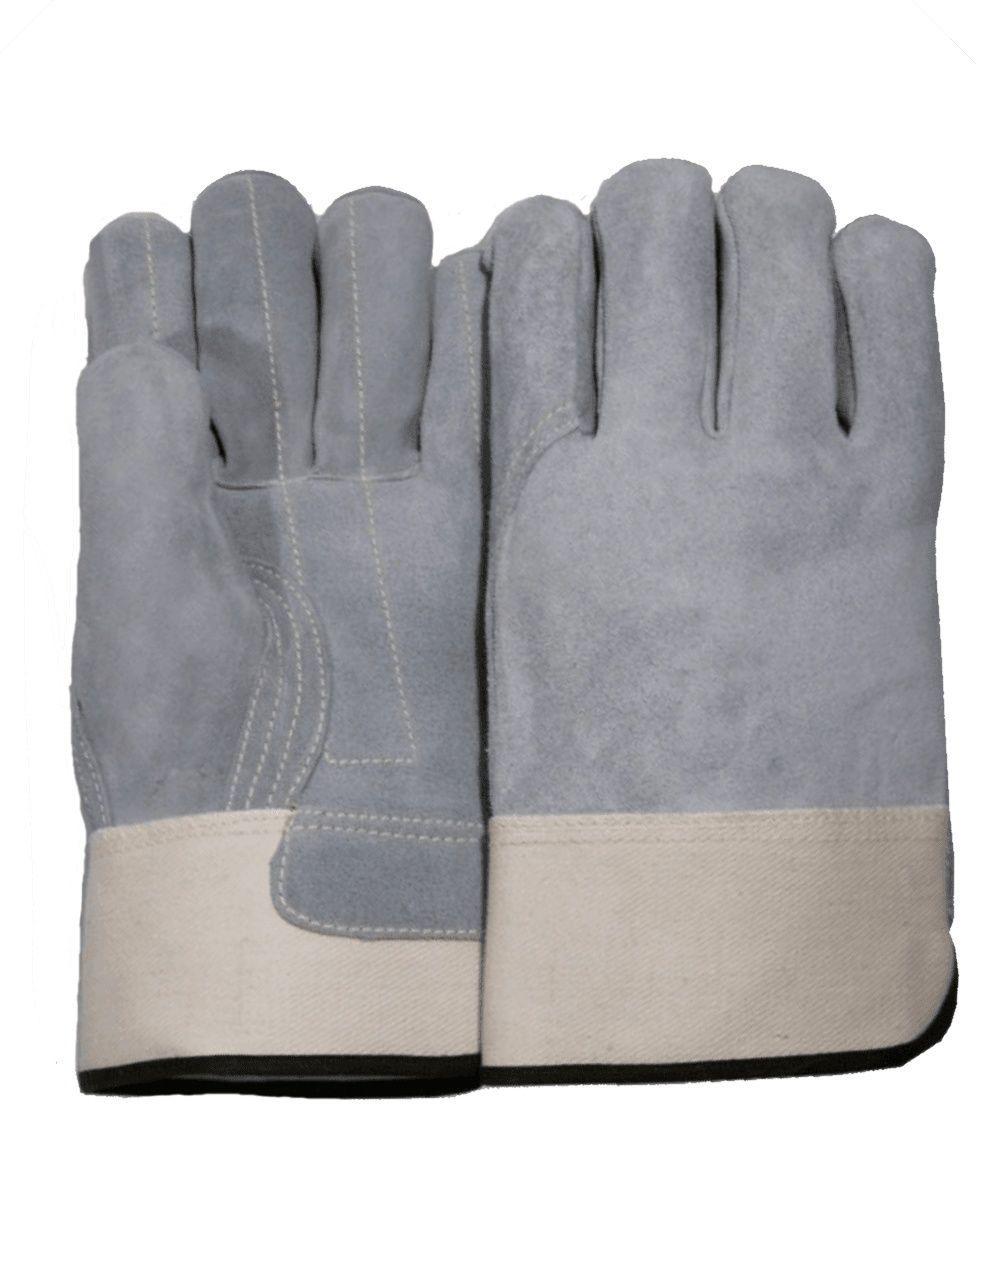 3pk wolverine leather work gloves extra large - Majestic 1831 Split Cowhide Leather Work Gloves Double Palm Kevlar Sewn Dozen